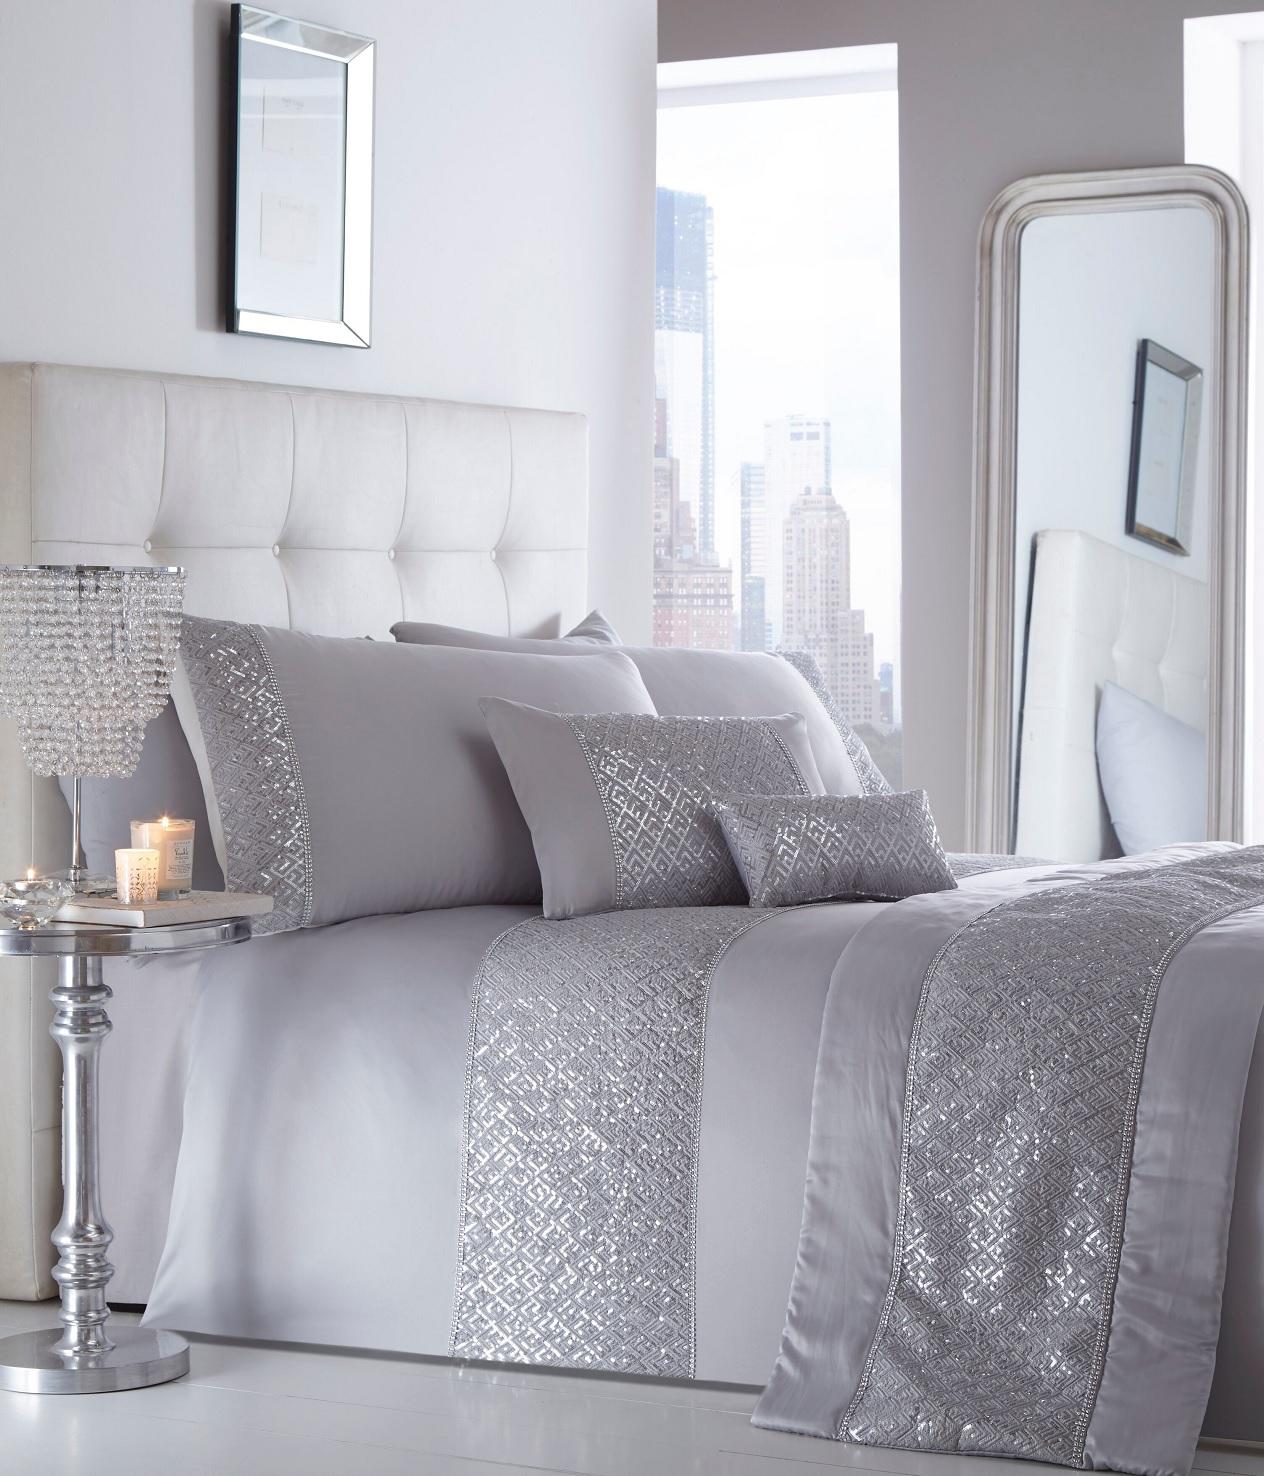 luxury sequin diamante duvet quilt cover bedding linen set. Black Bedroom Furniture Sets. Home Design Ideas